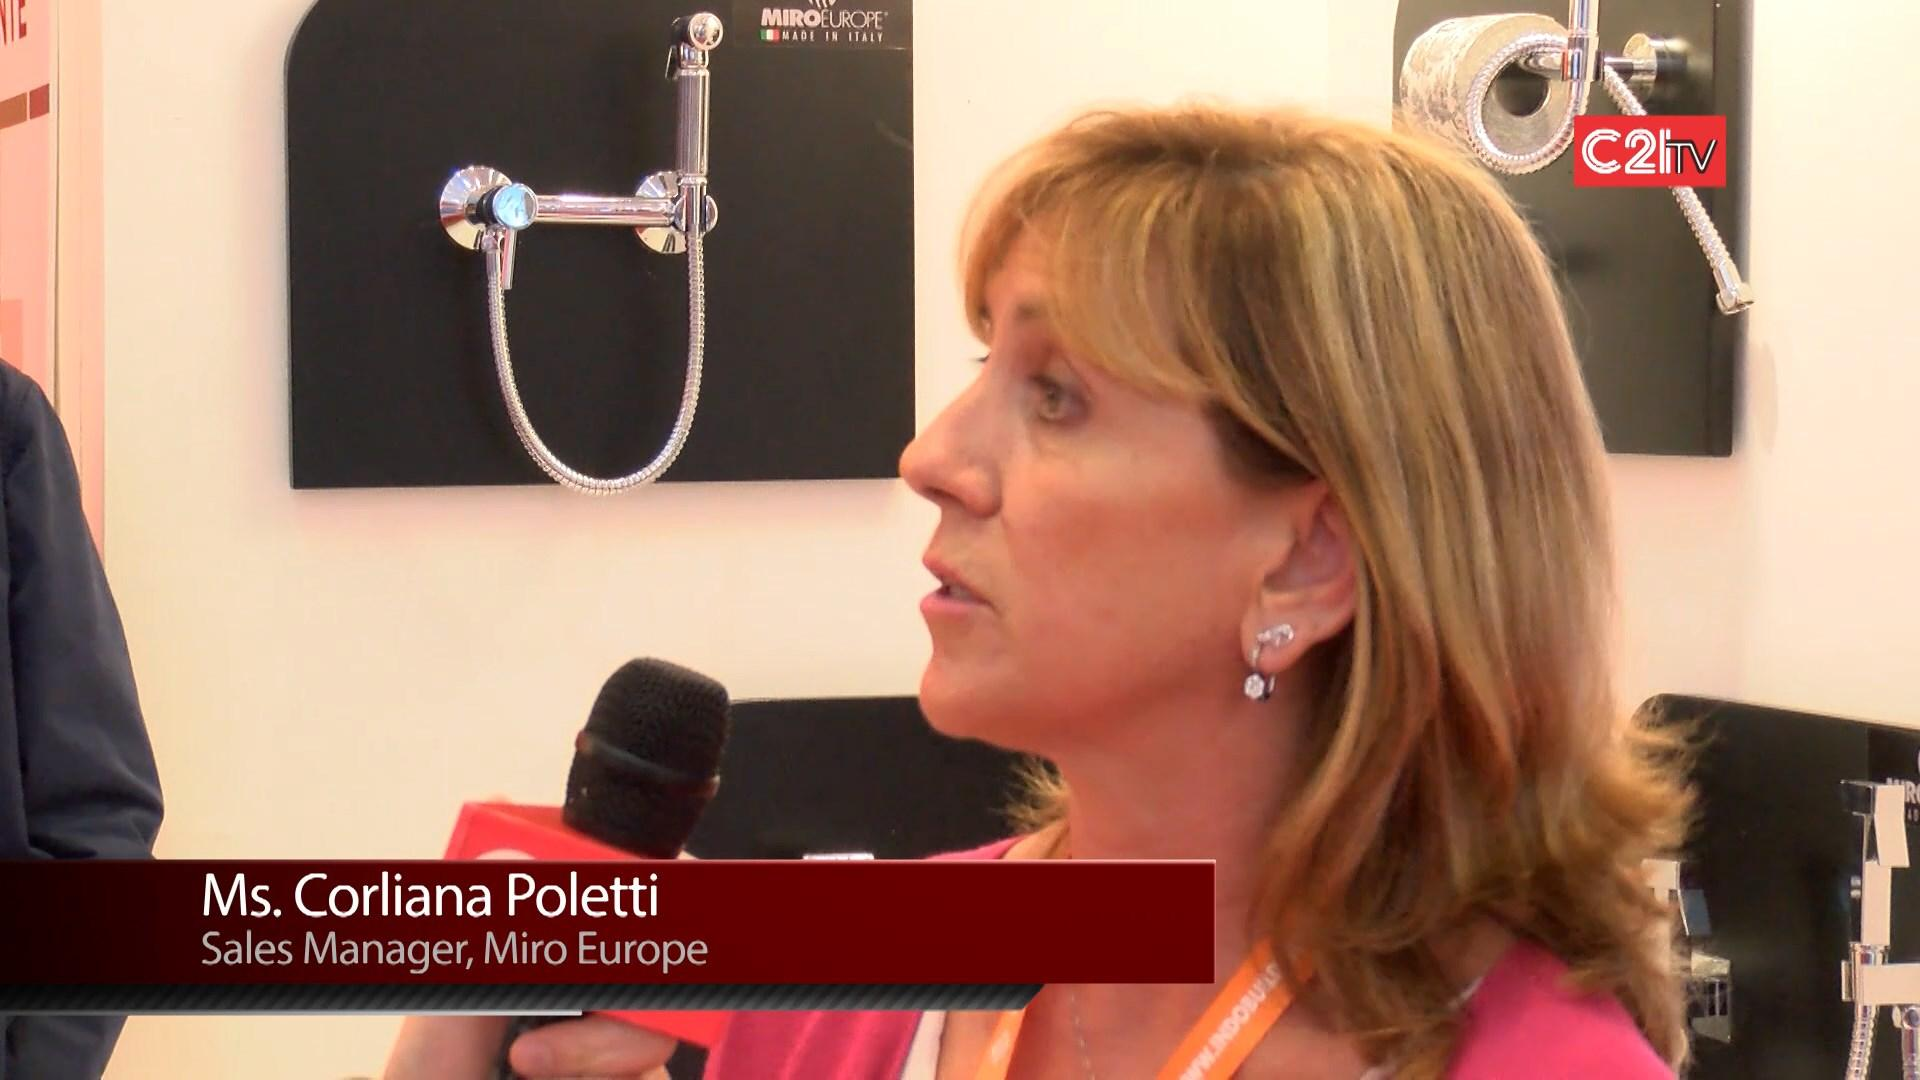 Italian Design Aesthetics on Premium Range of Personal Comfort Irrigation, Shower Systems